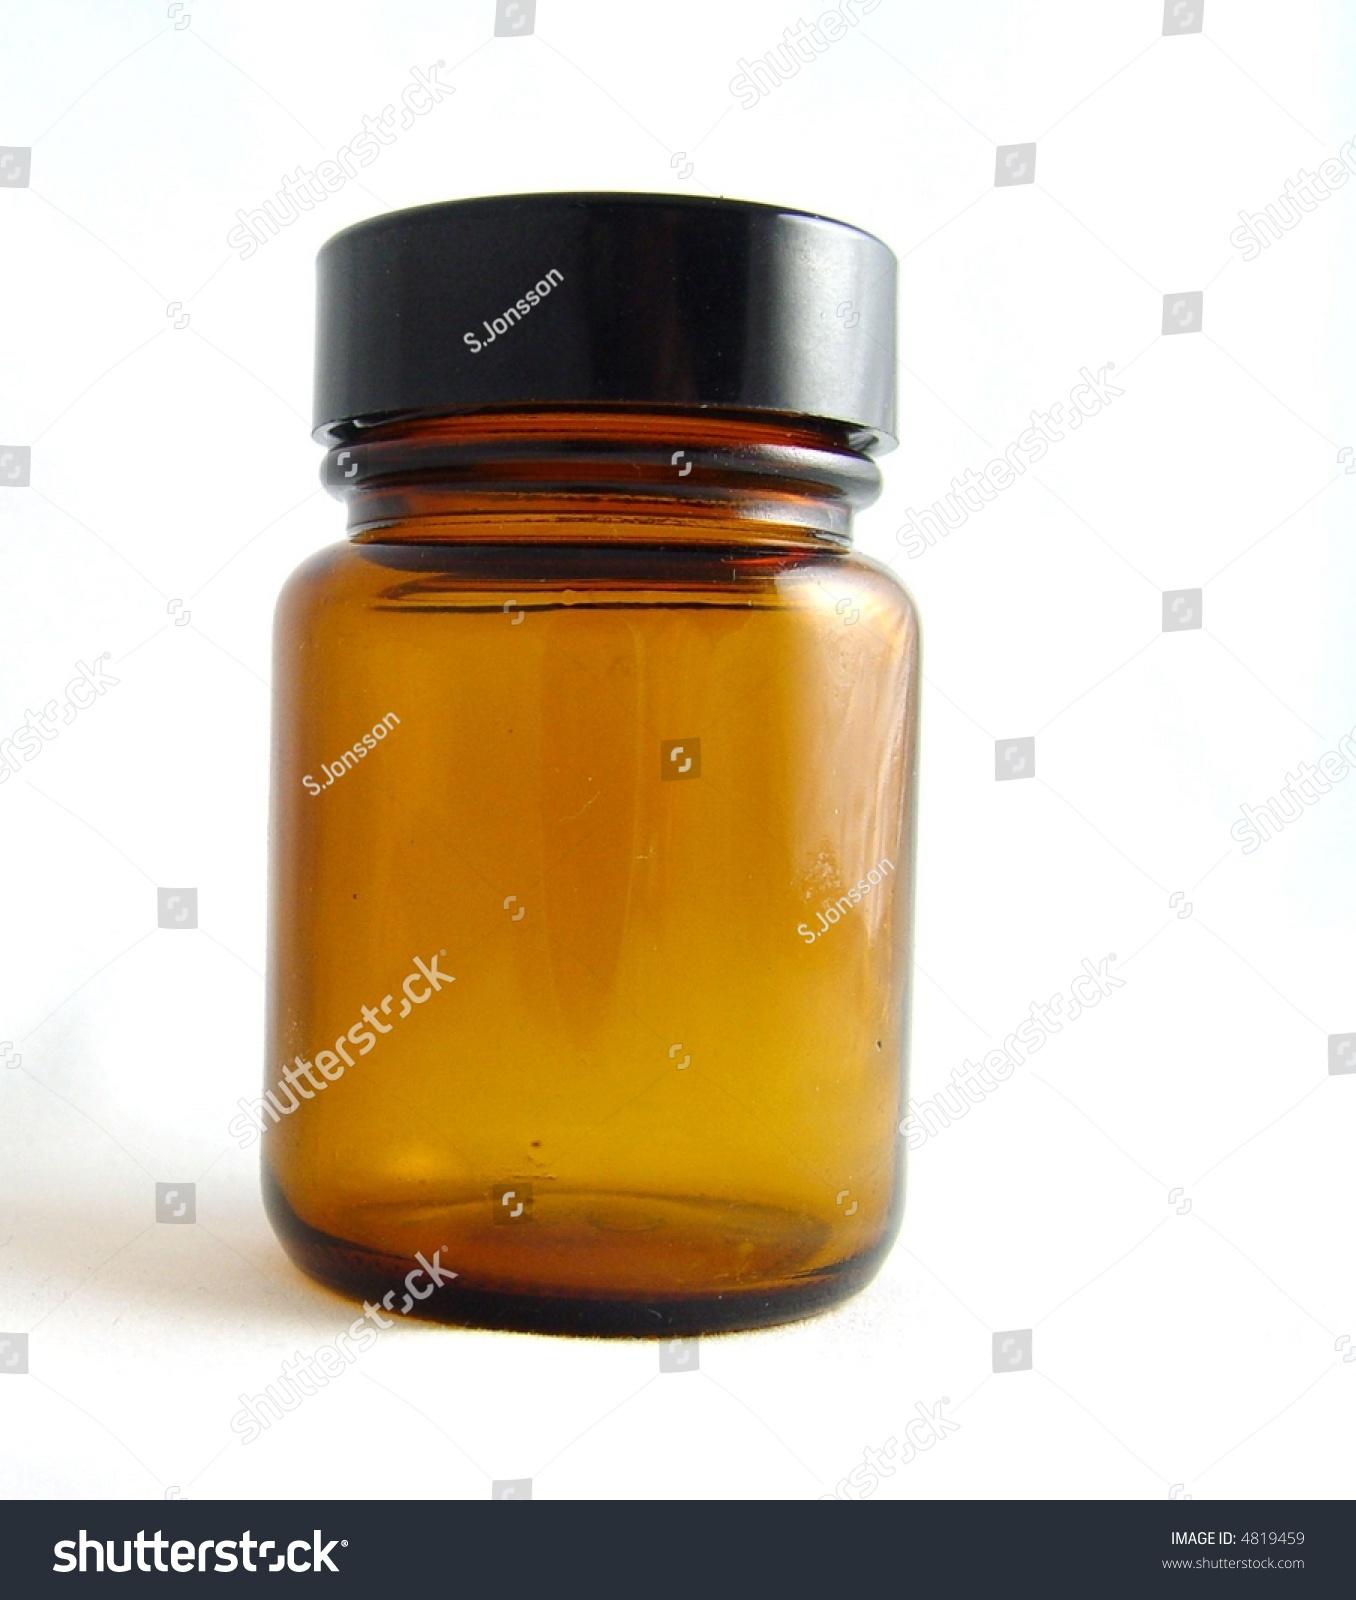 Empty Pill Bottle Stock Photo 4819459 - Shutterstock